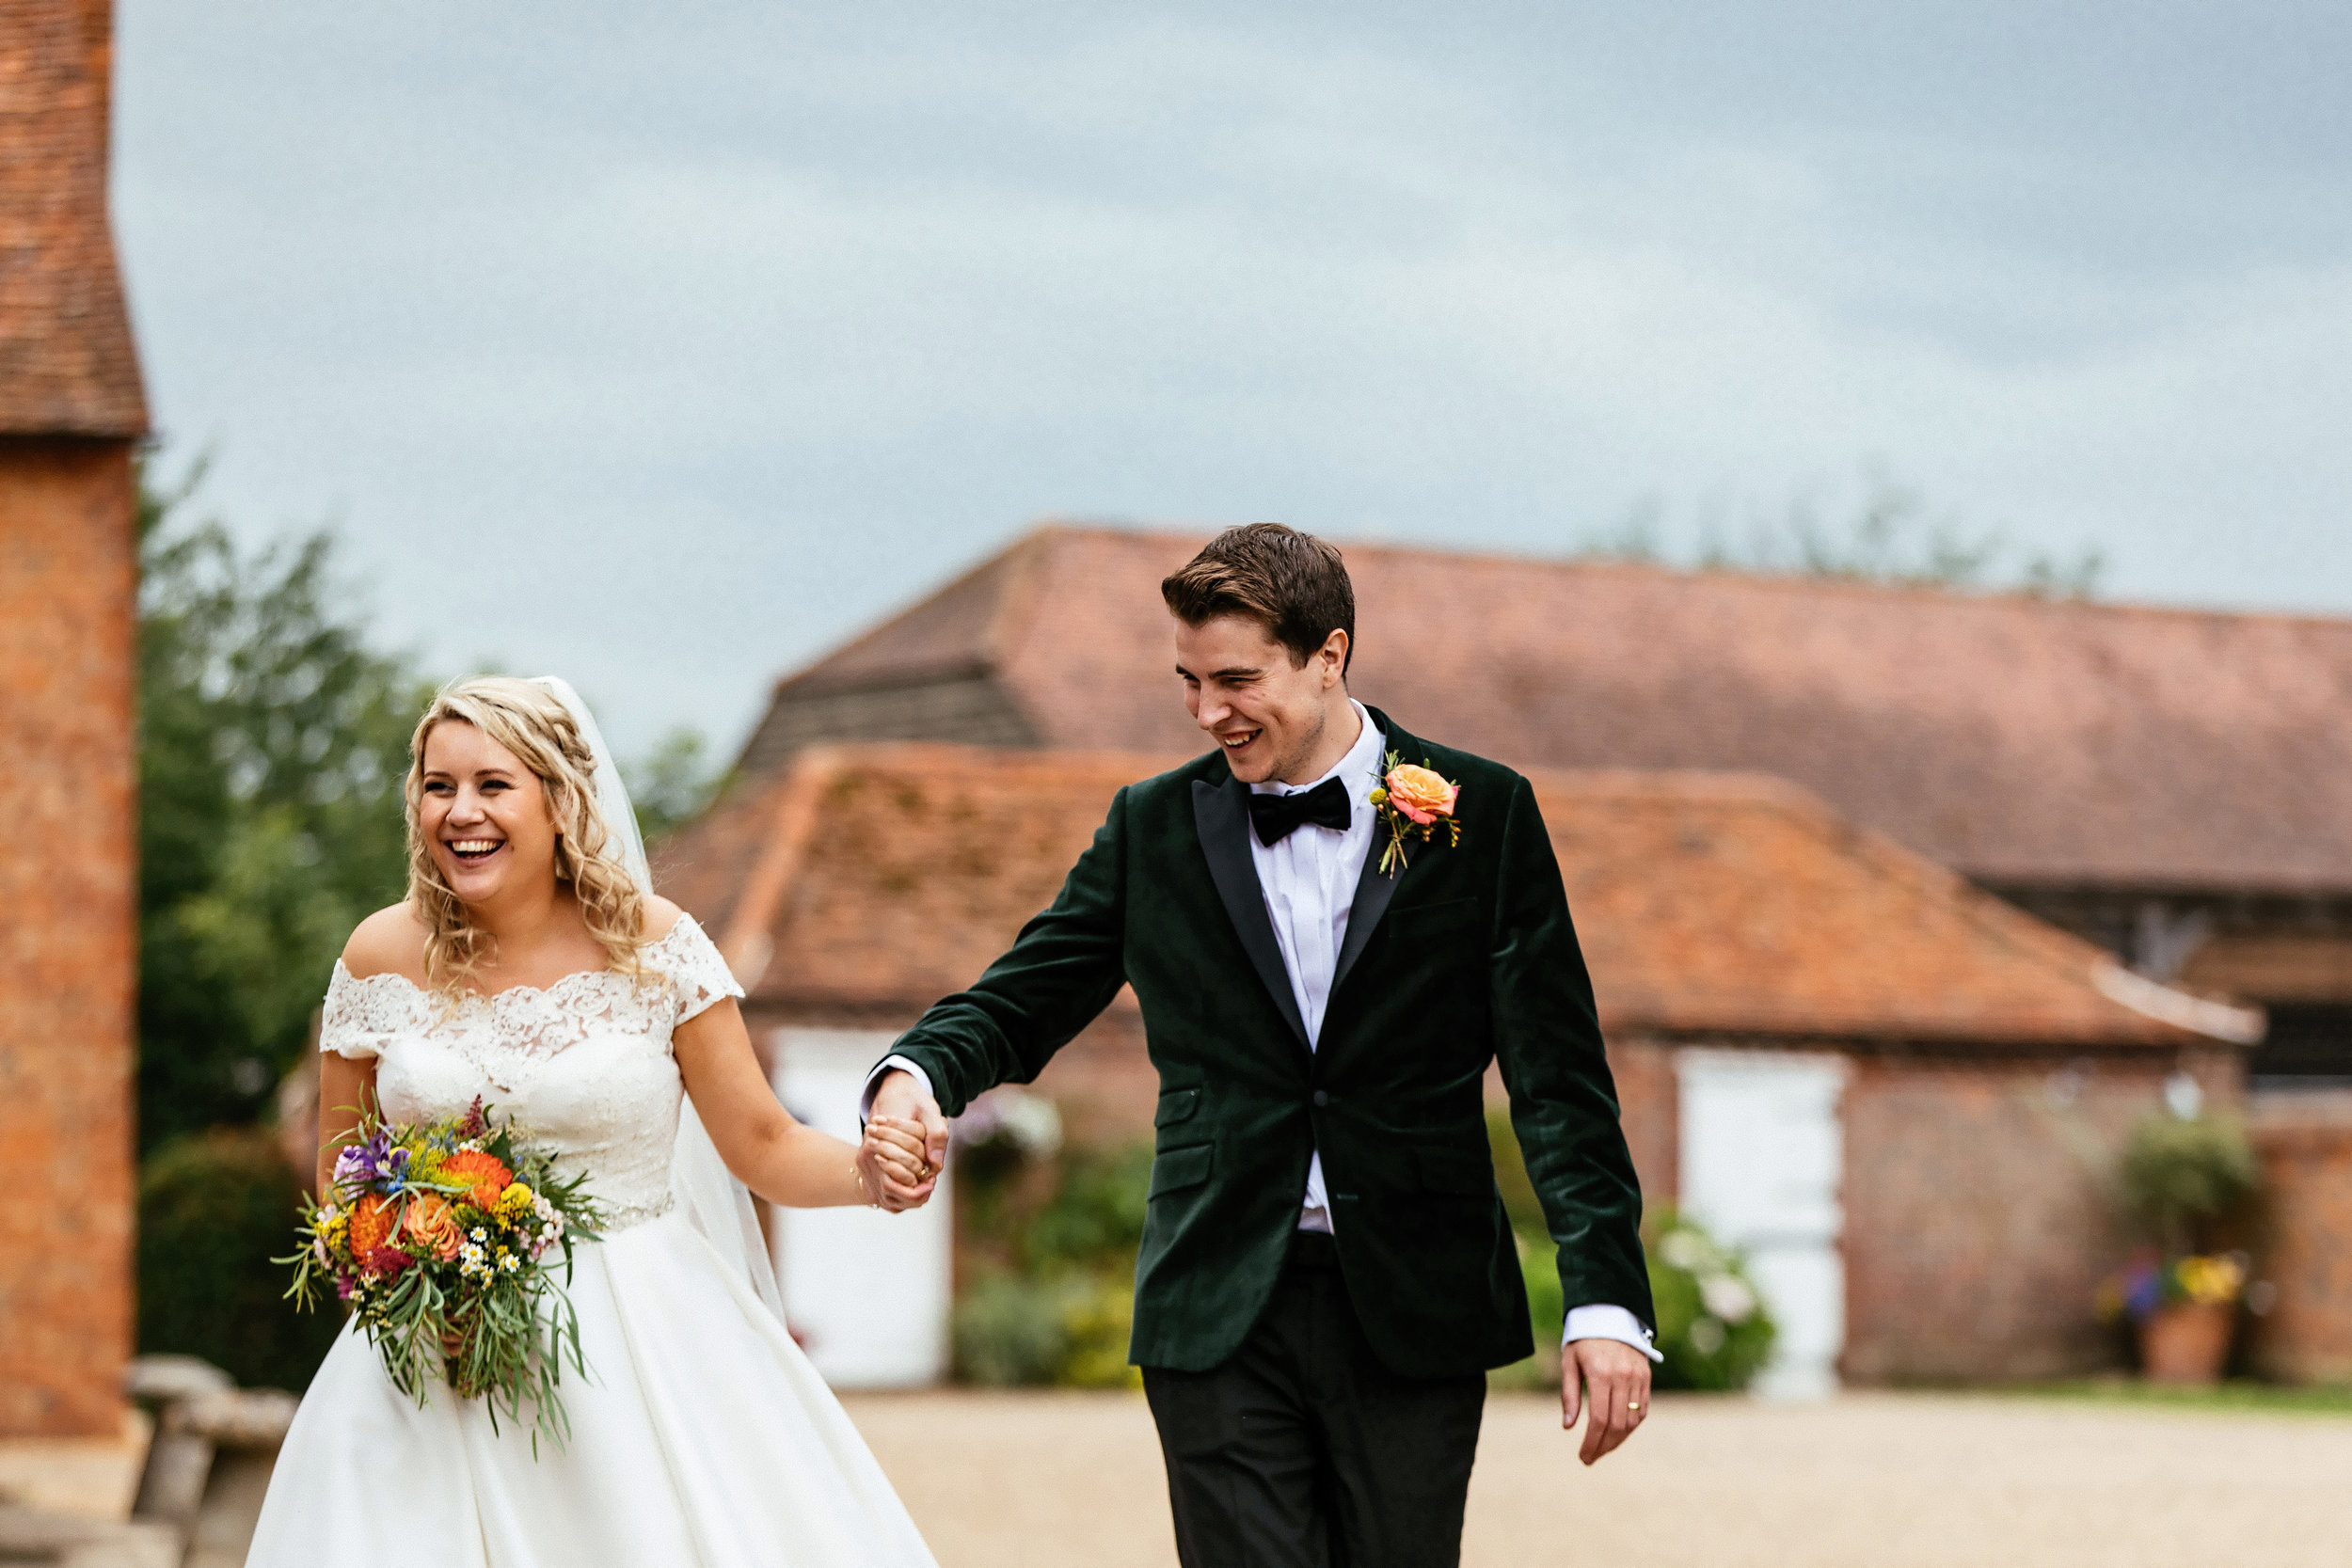 Tamara-and-Richard-Wedding-Highlights-49.jpg